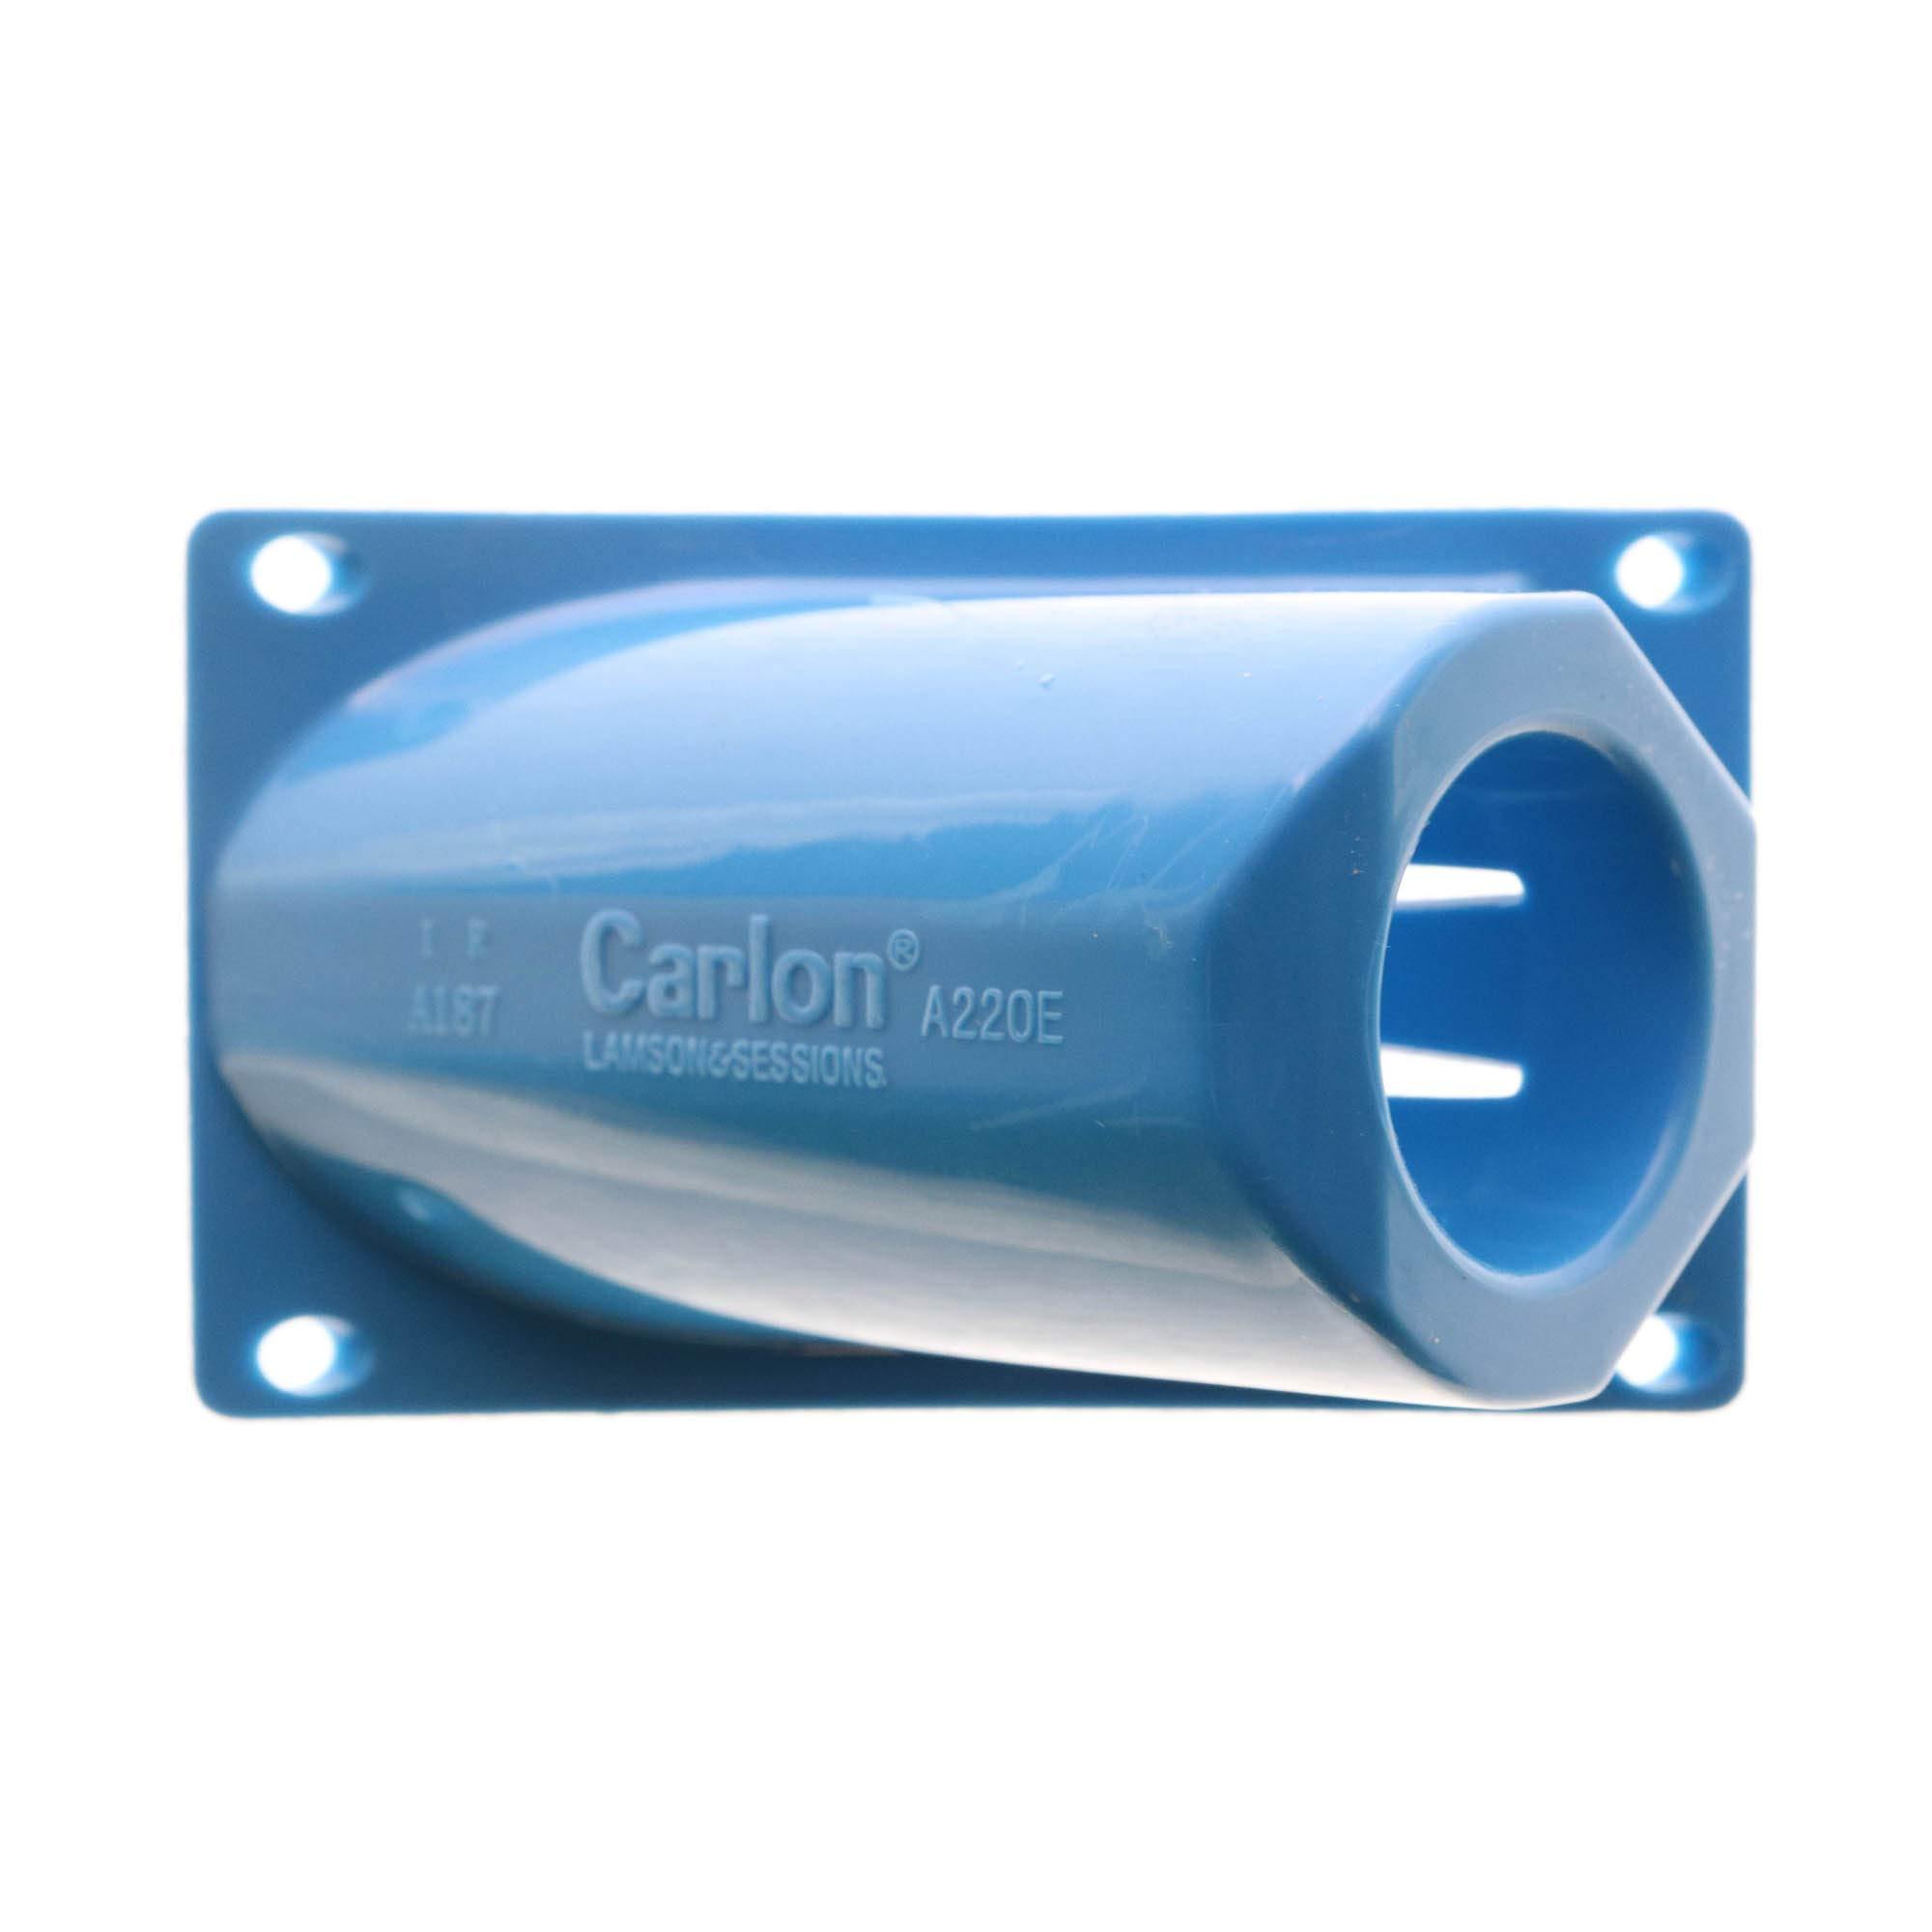 Carlon A220E ENT Non-Metallic Stubdown Fitting, 45°, 3/4-Inch, (25-Pack)